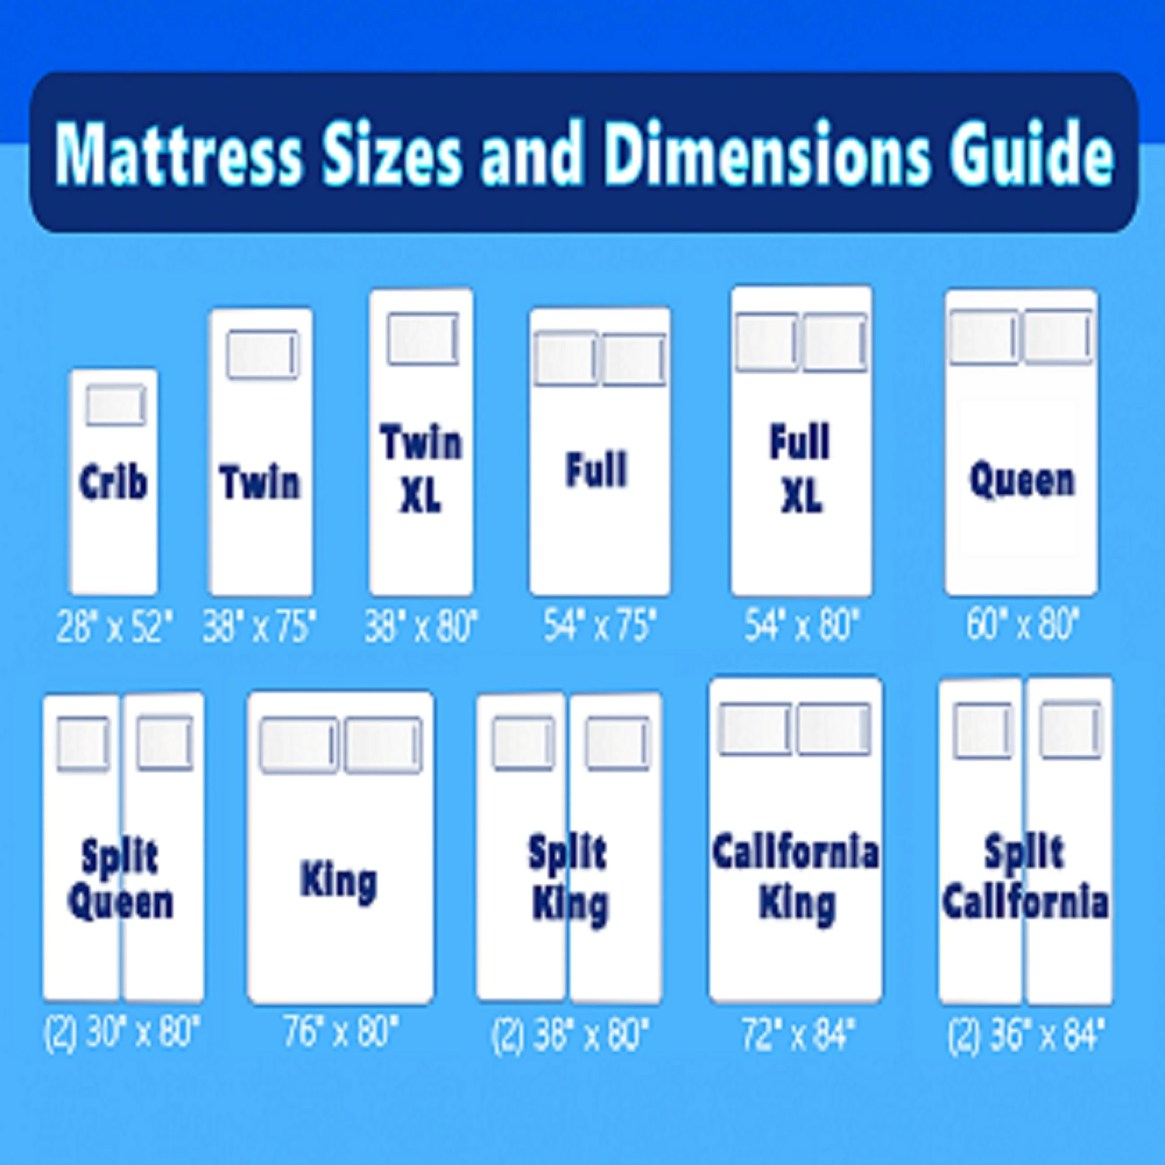 mattress-sizes-and-dimensions-20210708googleresize